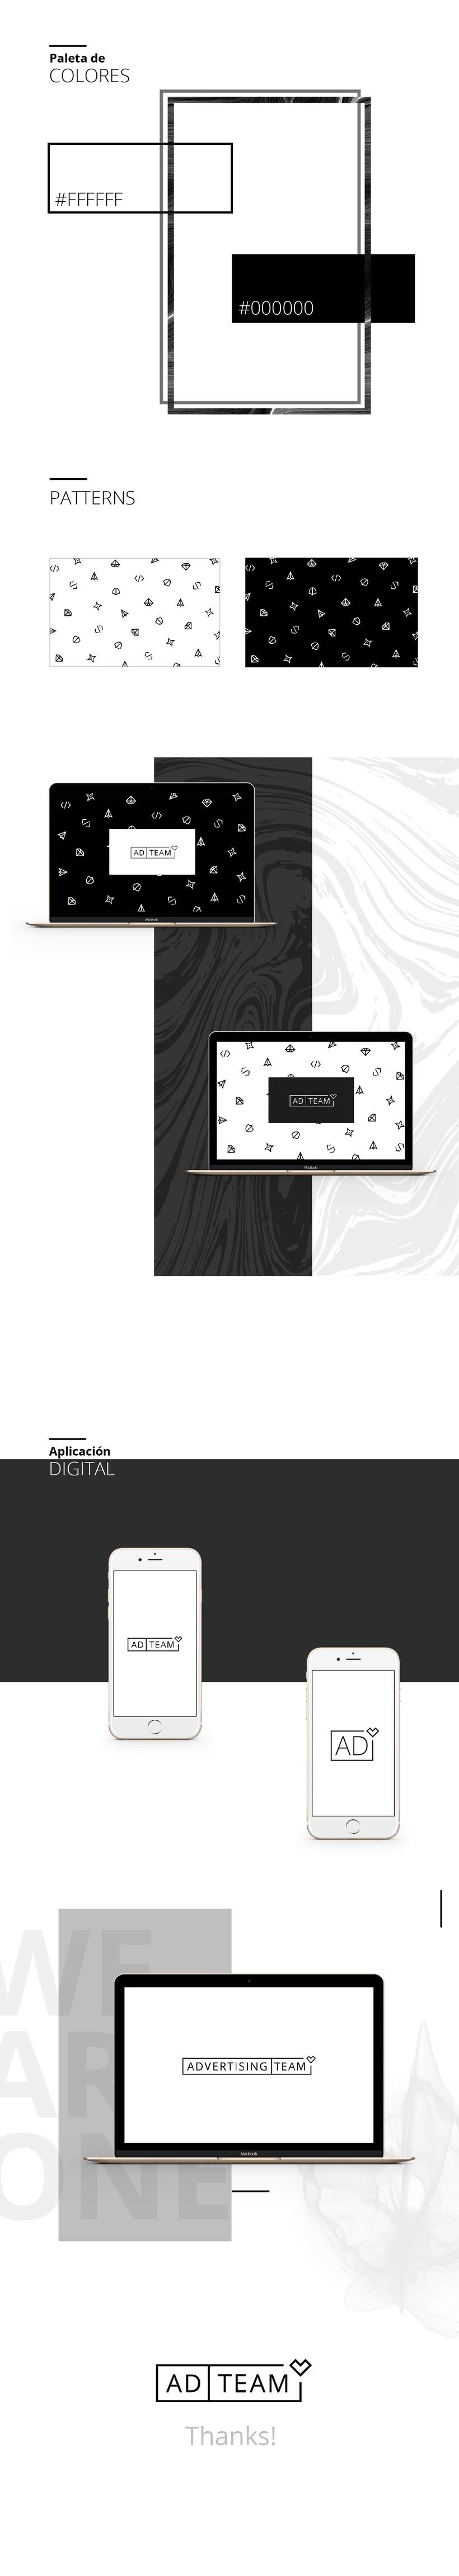 Brand Manual AD TEAM 3